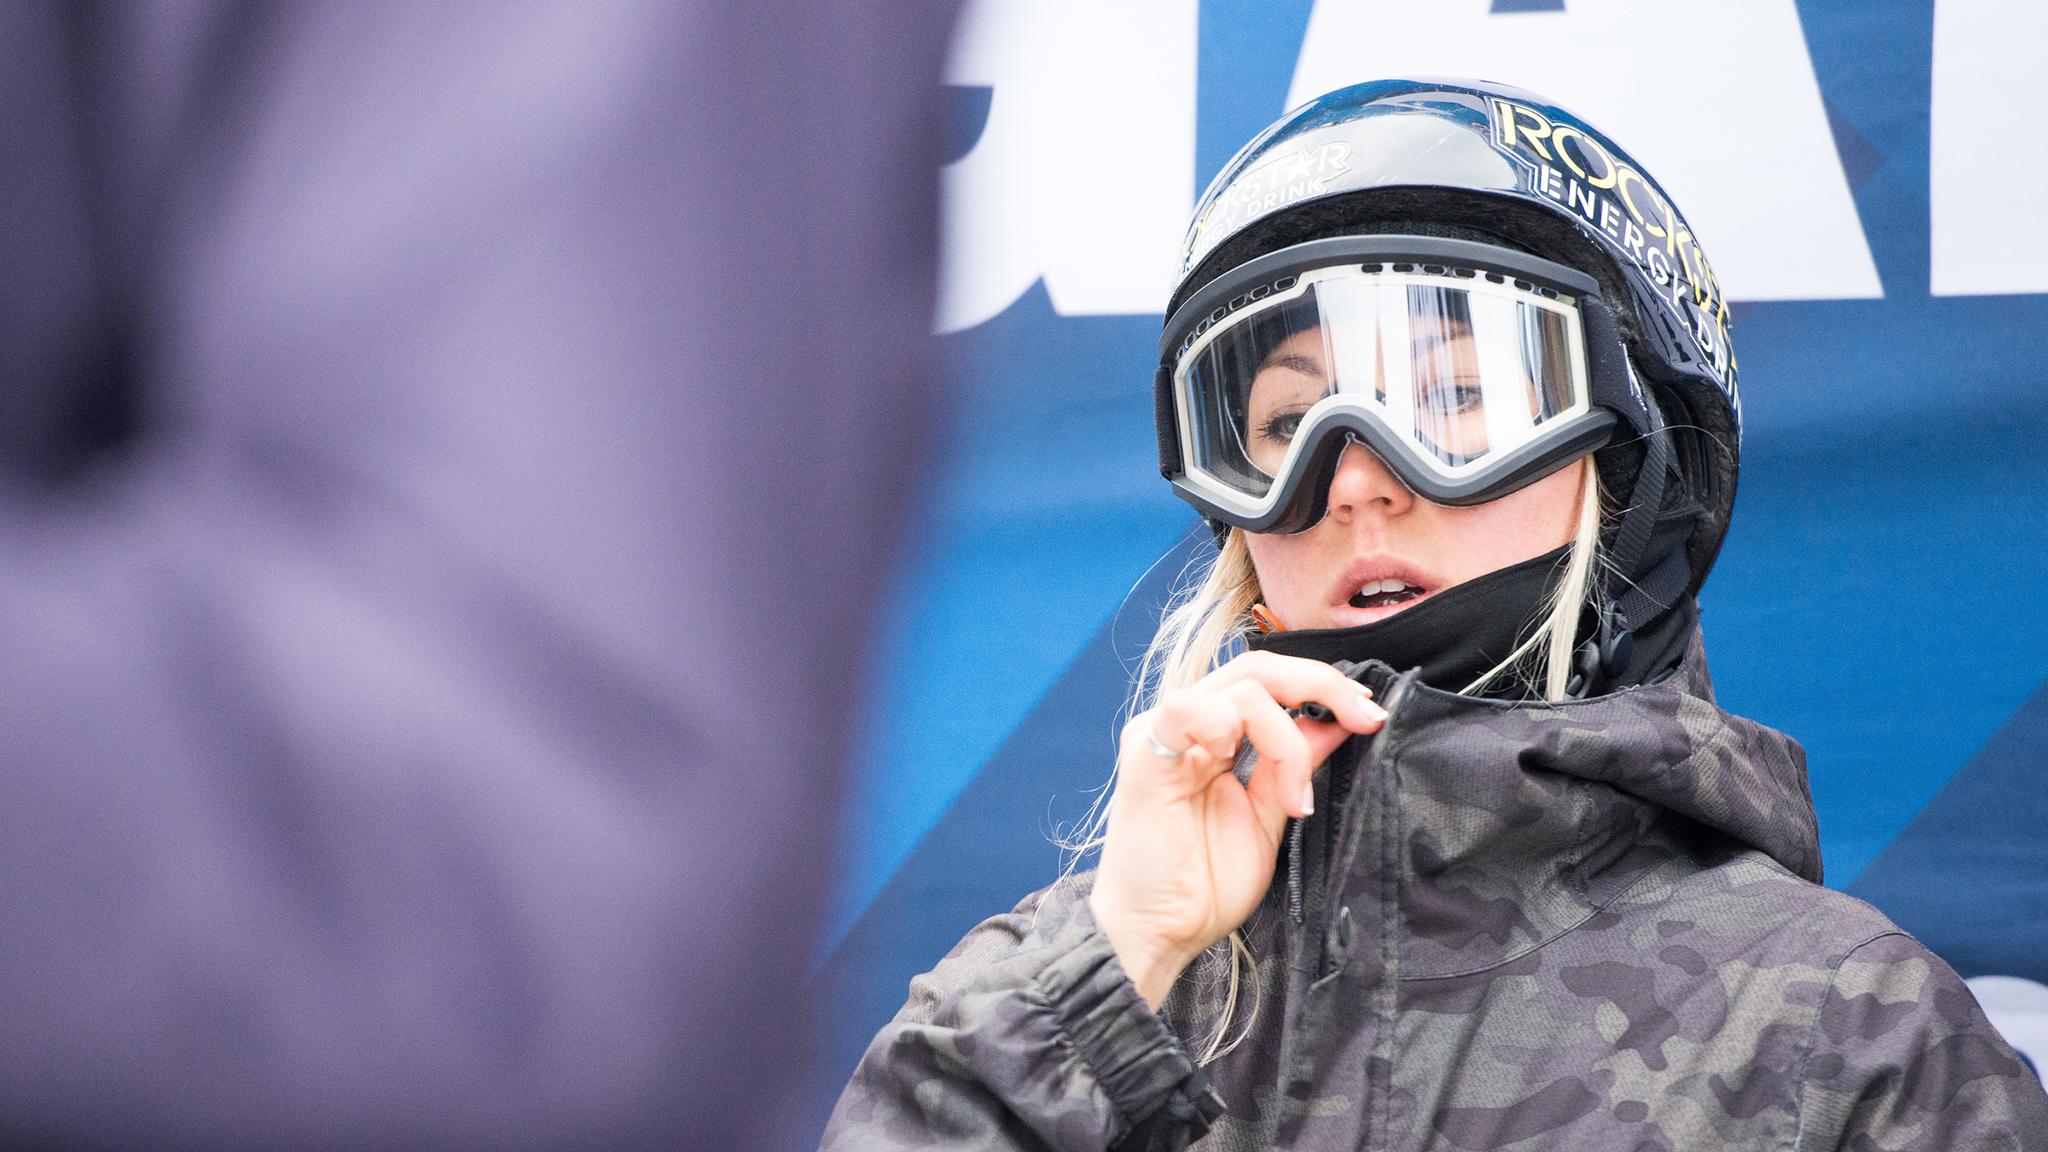 Snowboarder Christy Prior